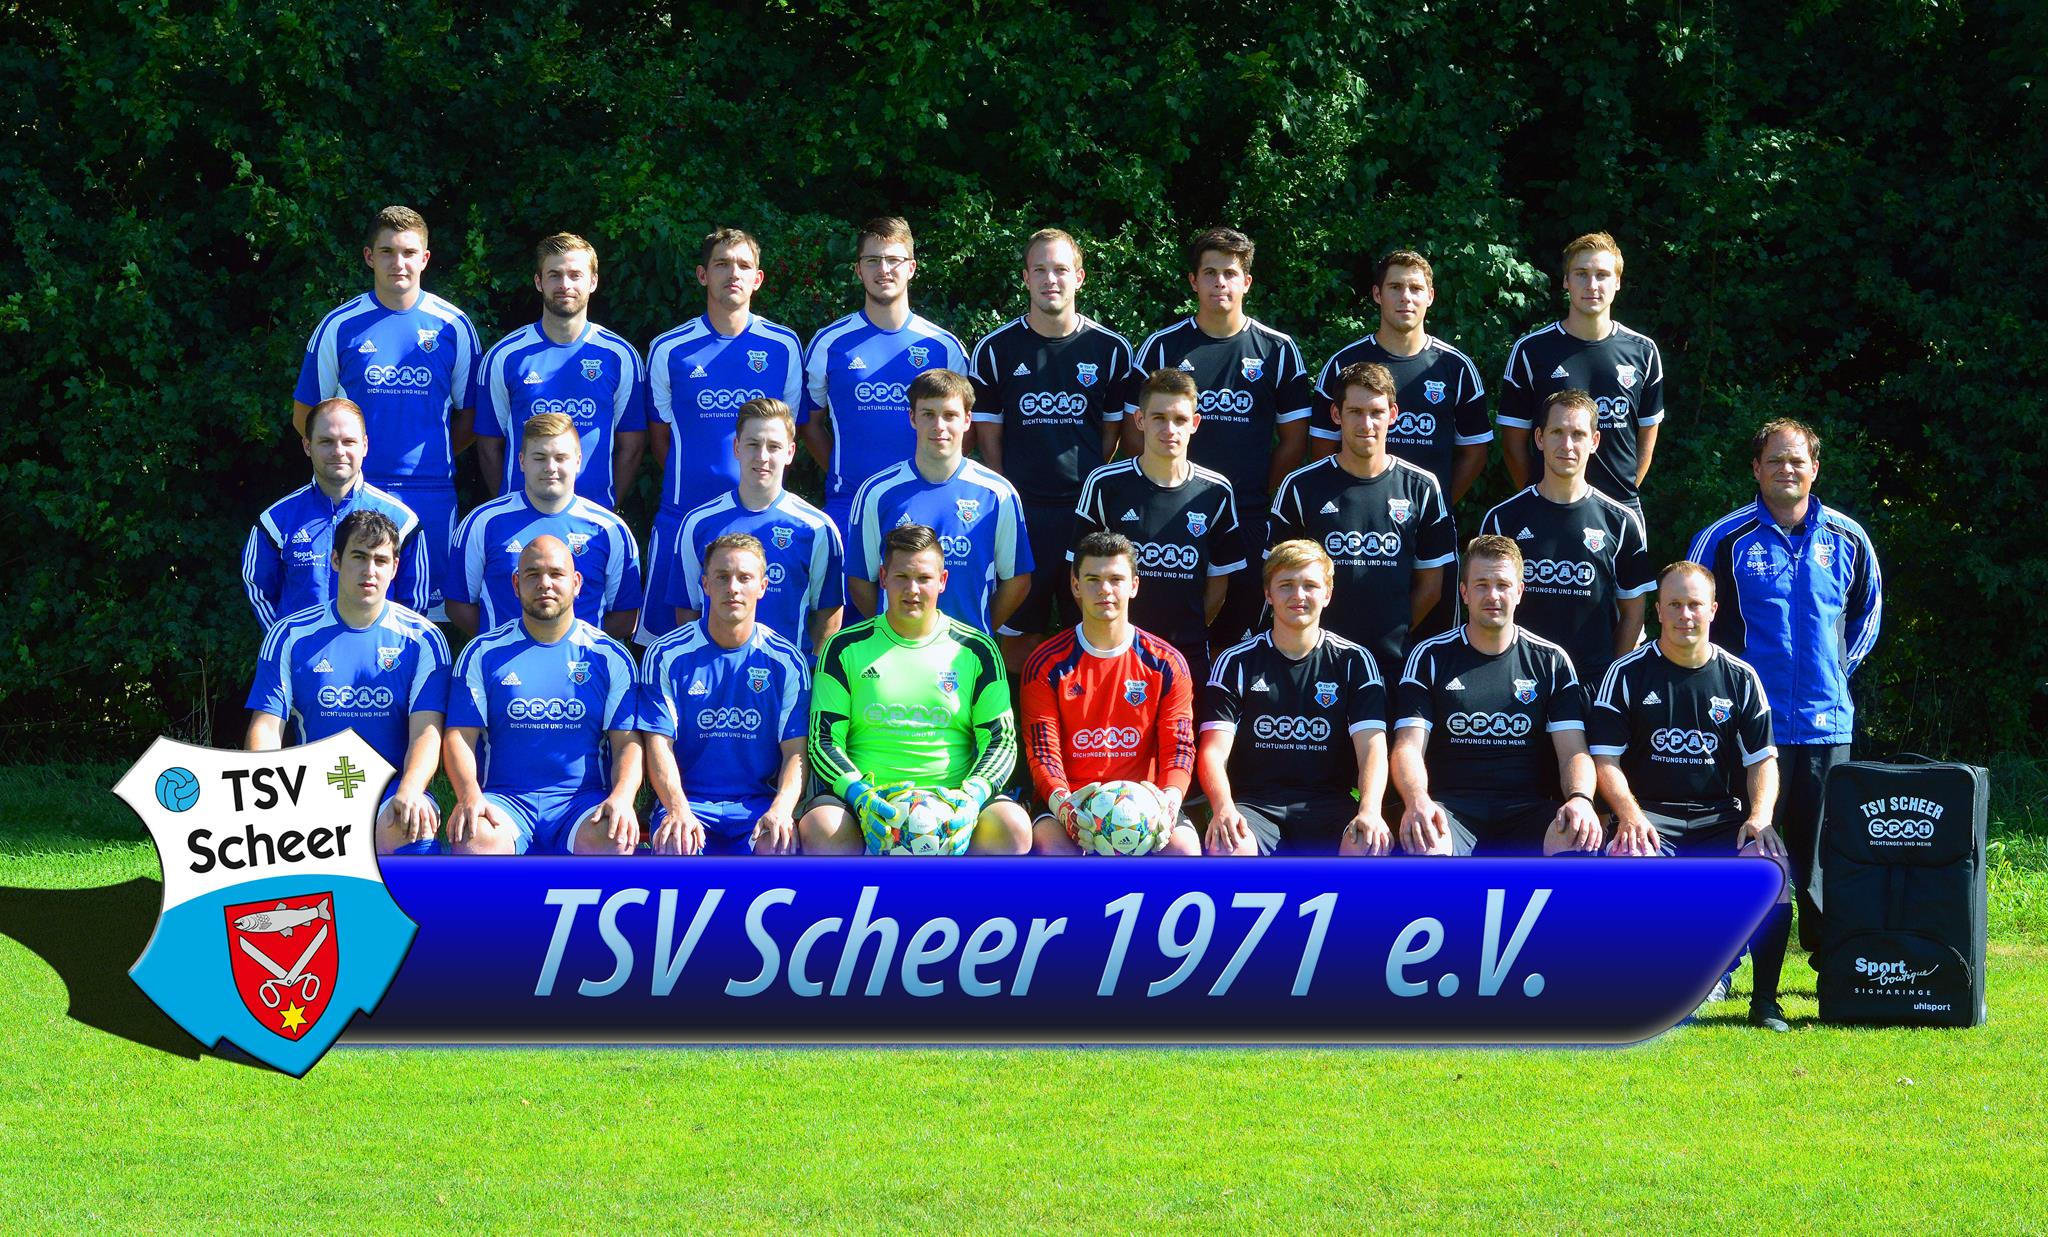 Sv Scheer